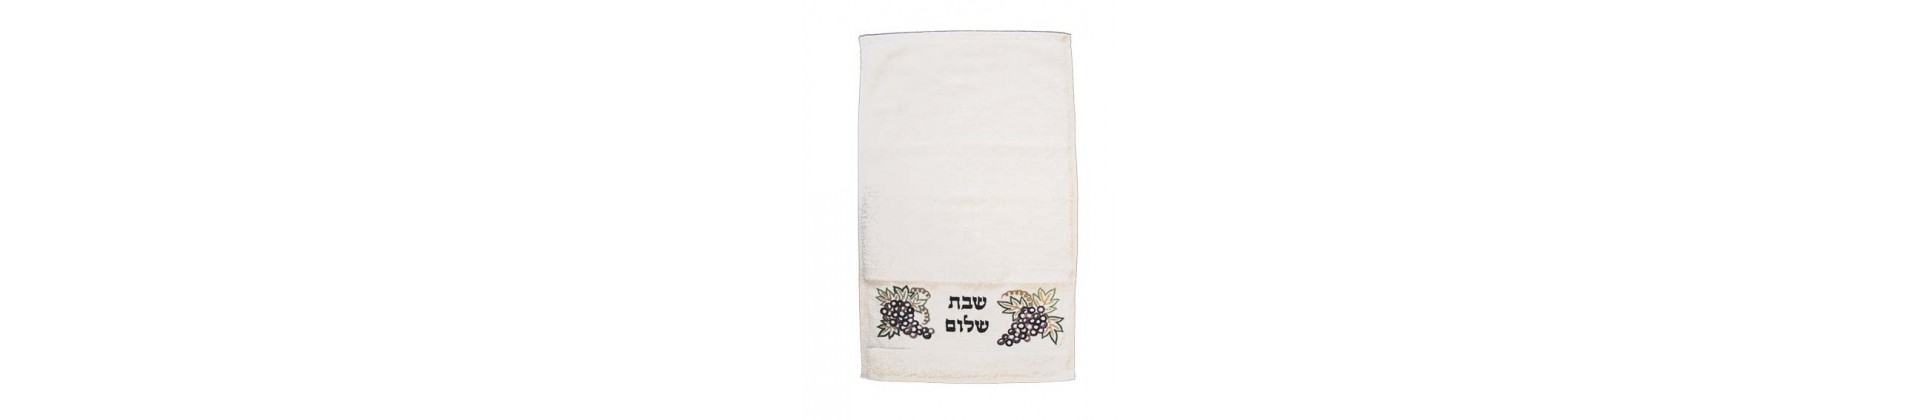 Netilat towel